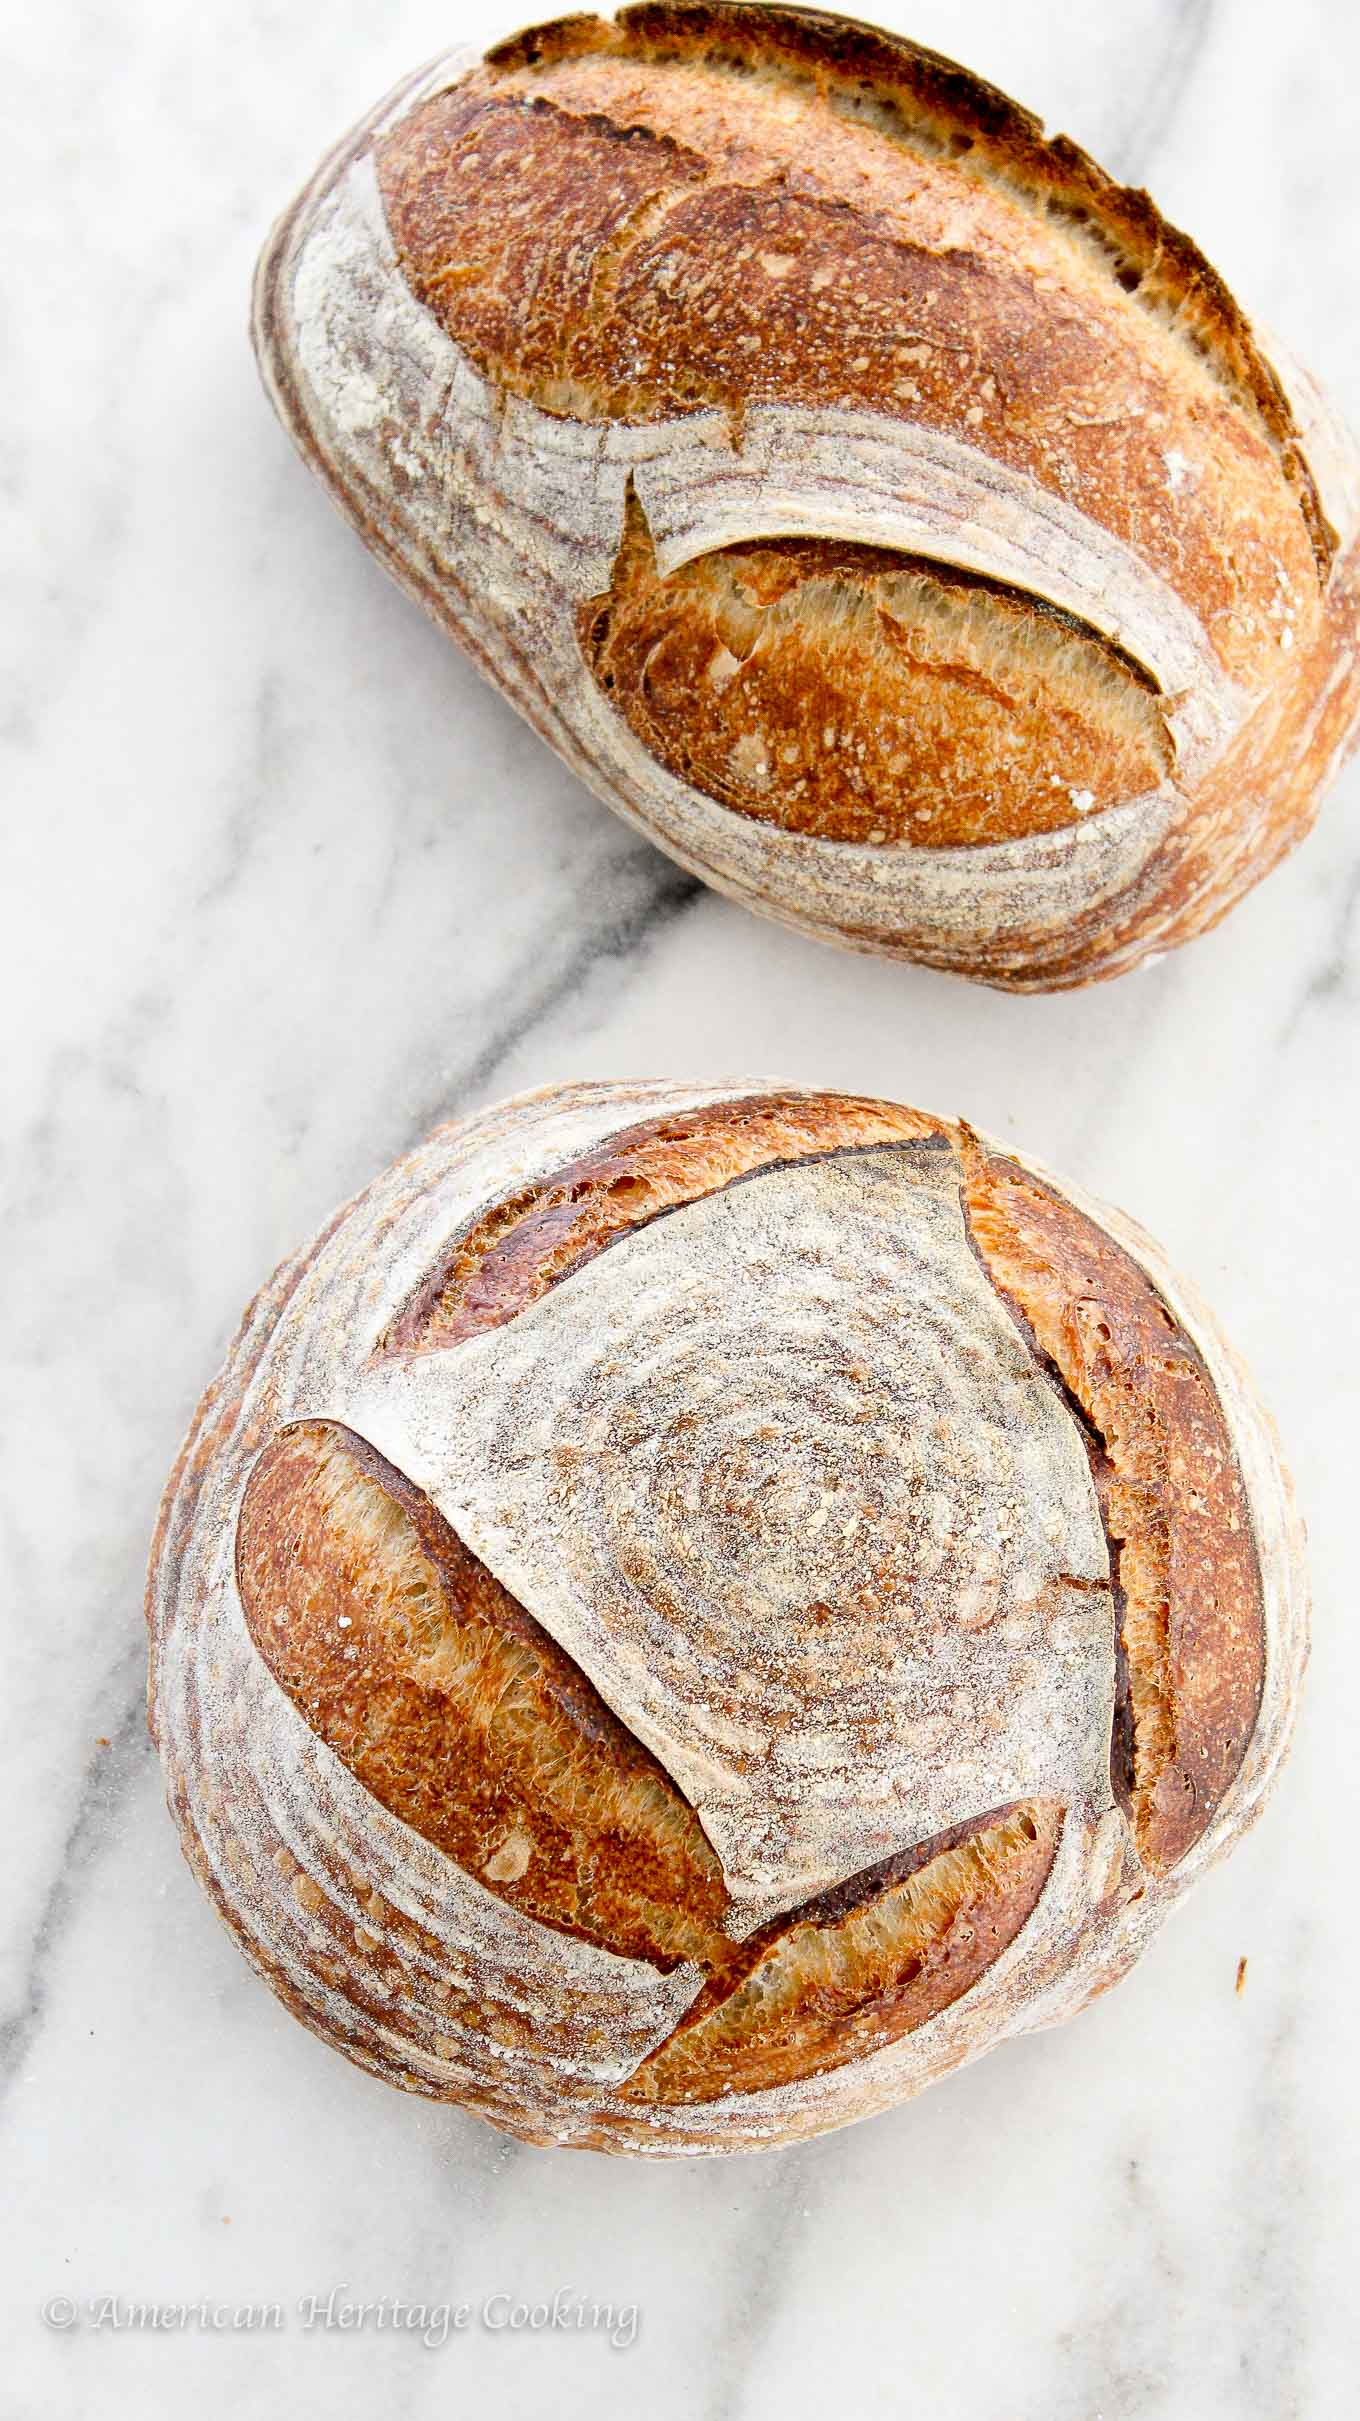 Basic Sourdough Bread Tutorial